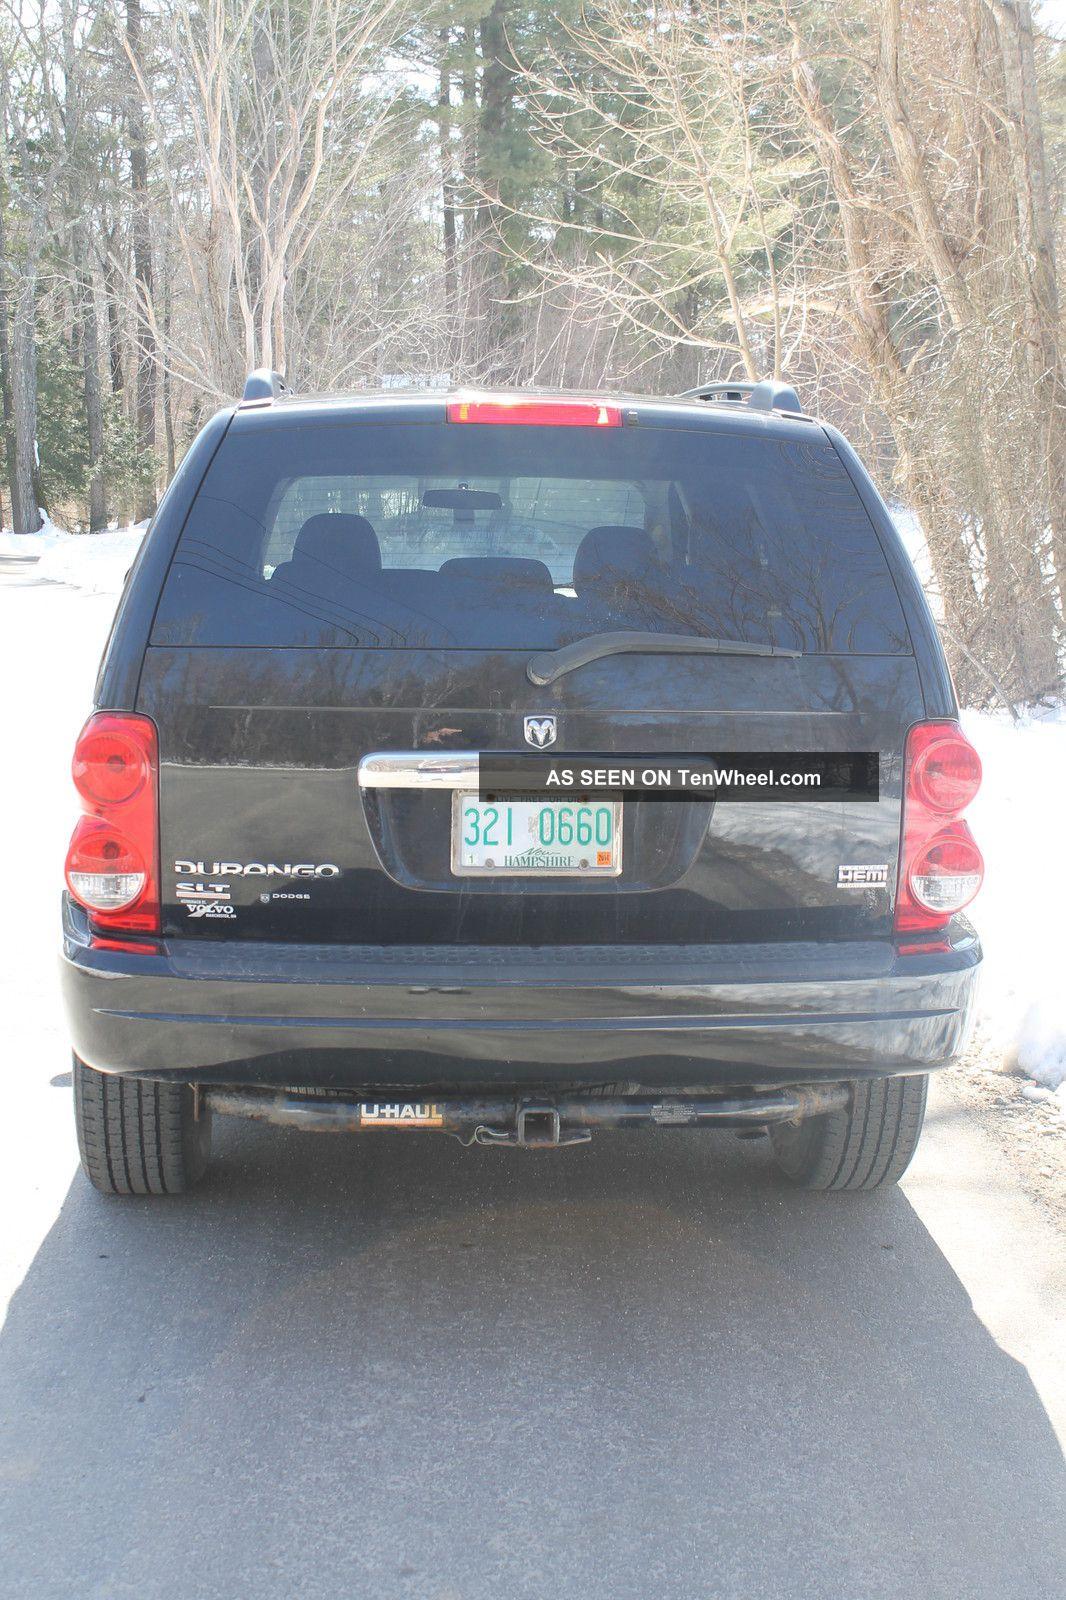 2004 Dodge Durango Slt 5  7l Hemi 4wd